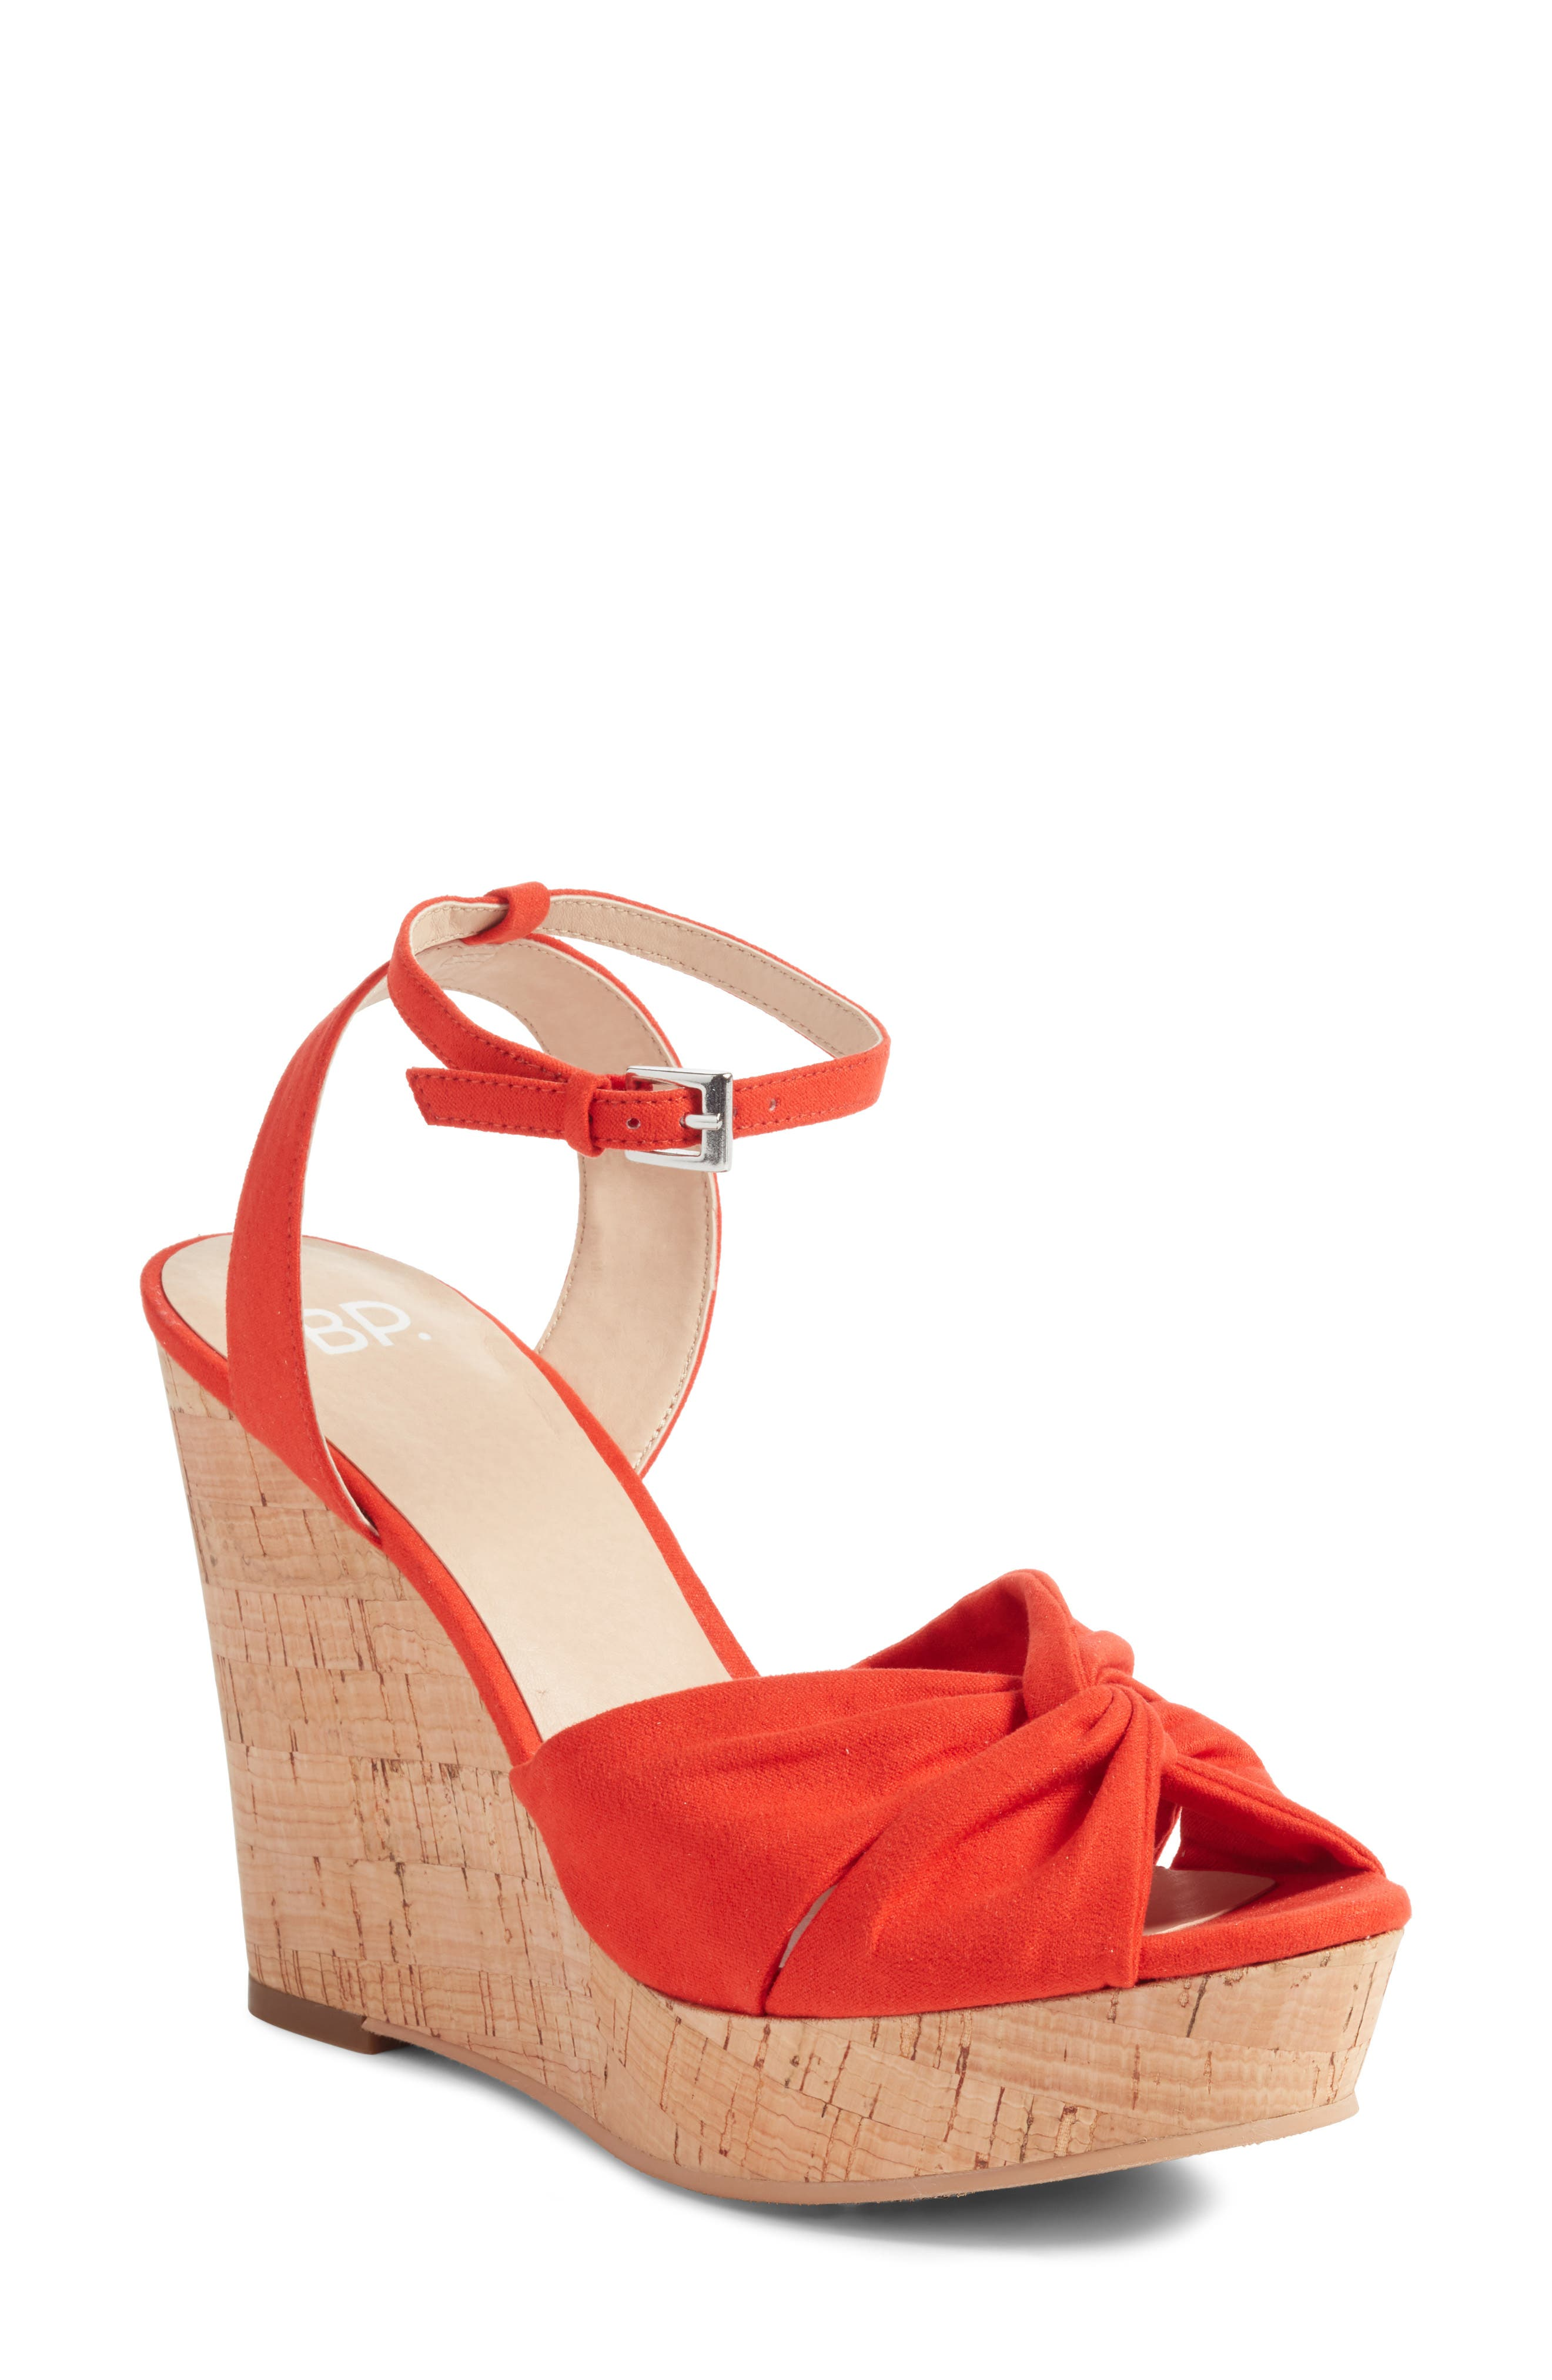 Arya Platform Wedge Sandal,                             Main thumbnail 1, color,                             Poppy Faux Suede